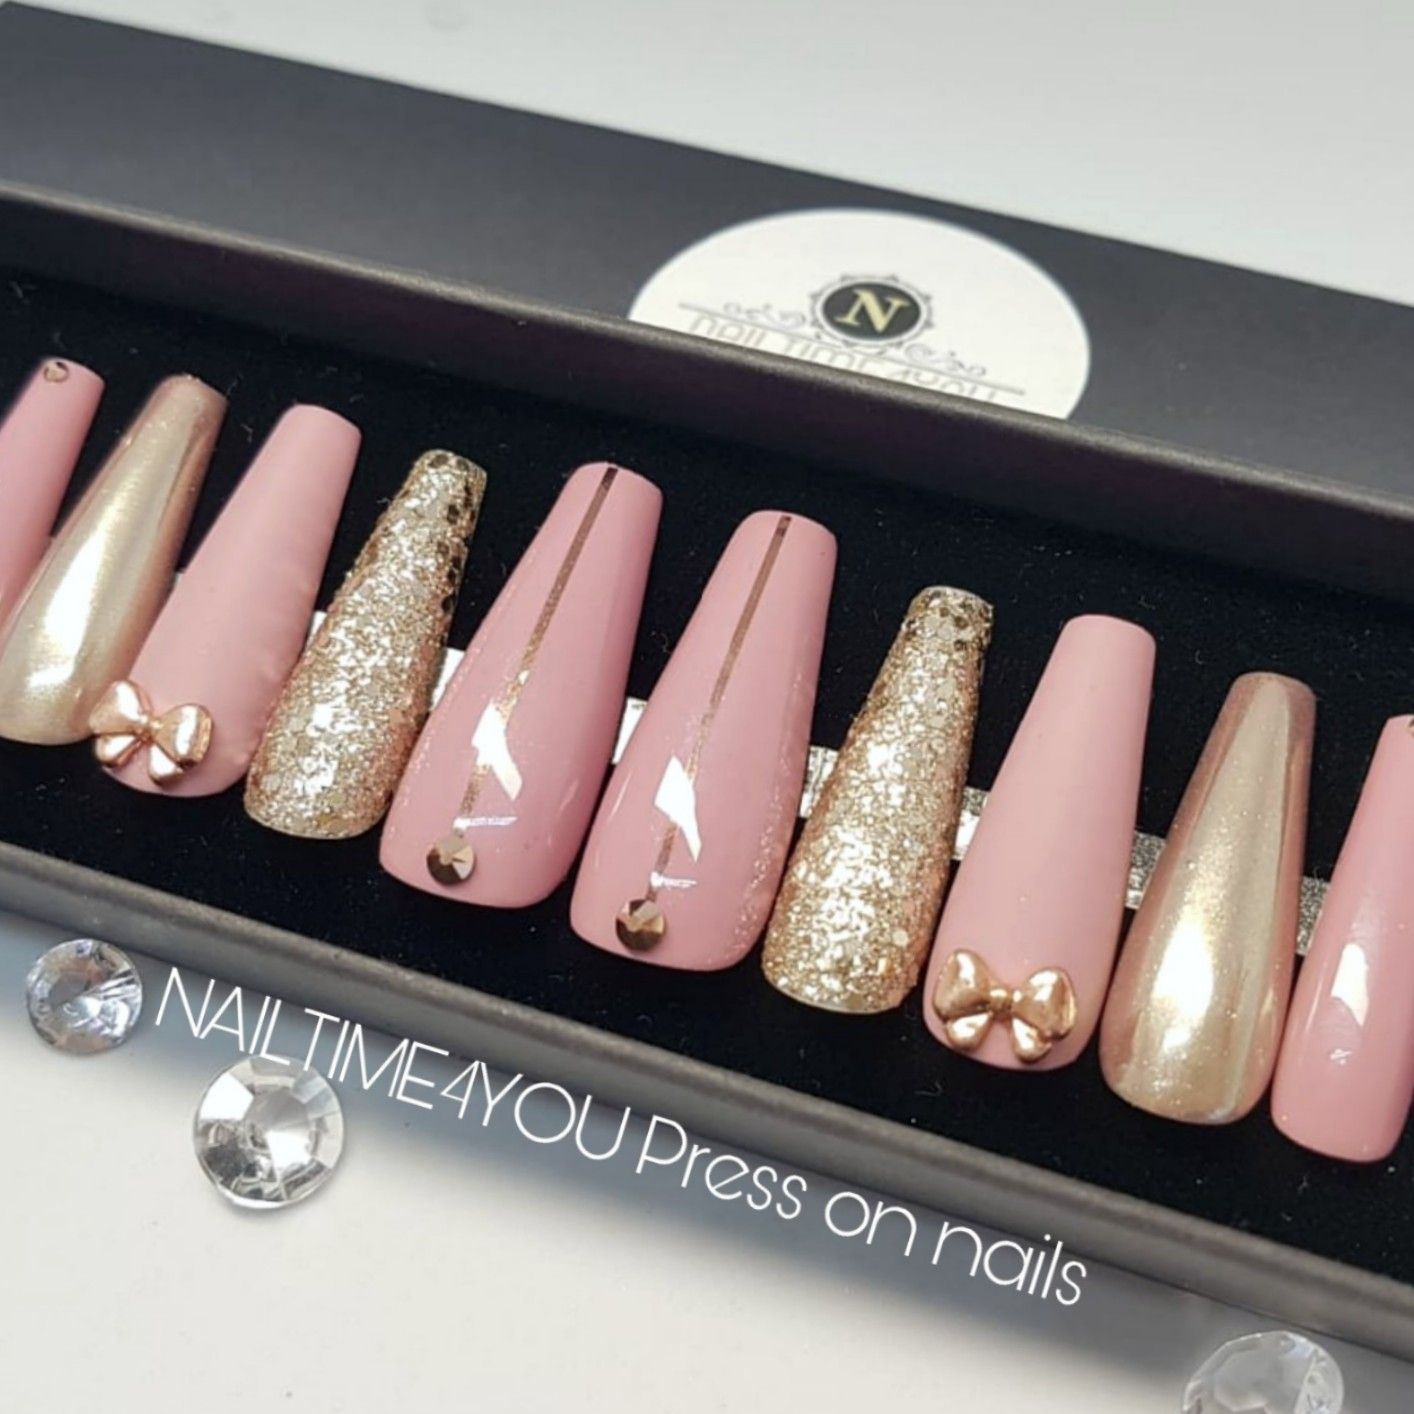 Chrome Mauve Press On Nails Acrylic Nails False Nails Press On Coffin Fake Nails Nails In 2020 Press On Nails Glue On Nails Fake Nails